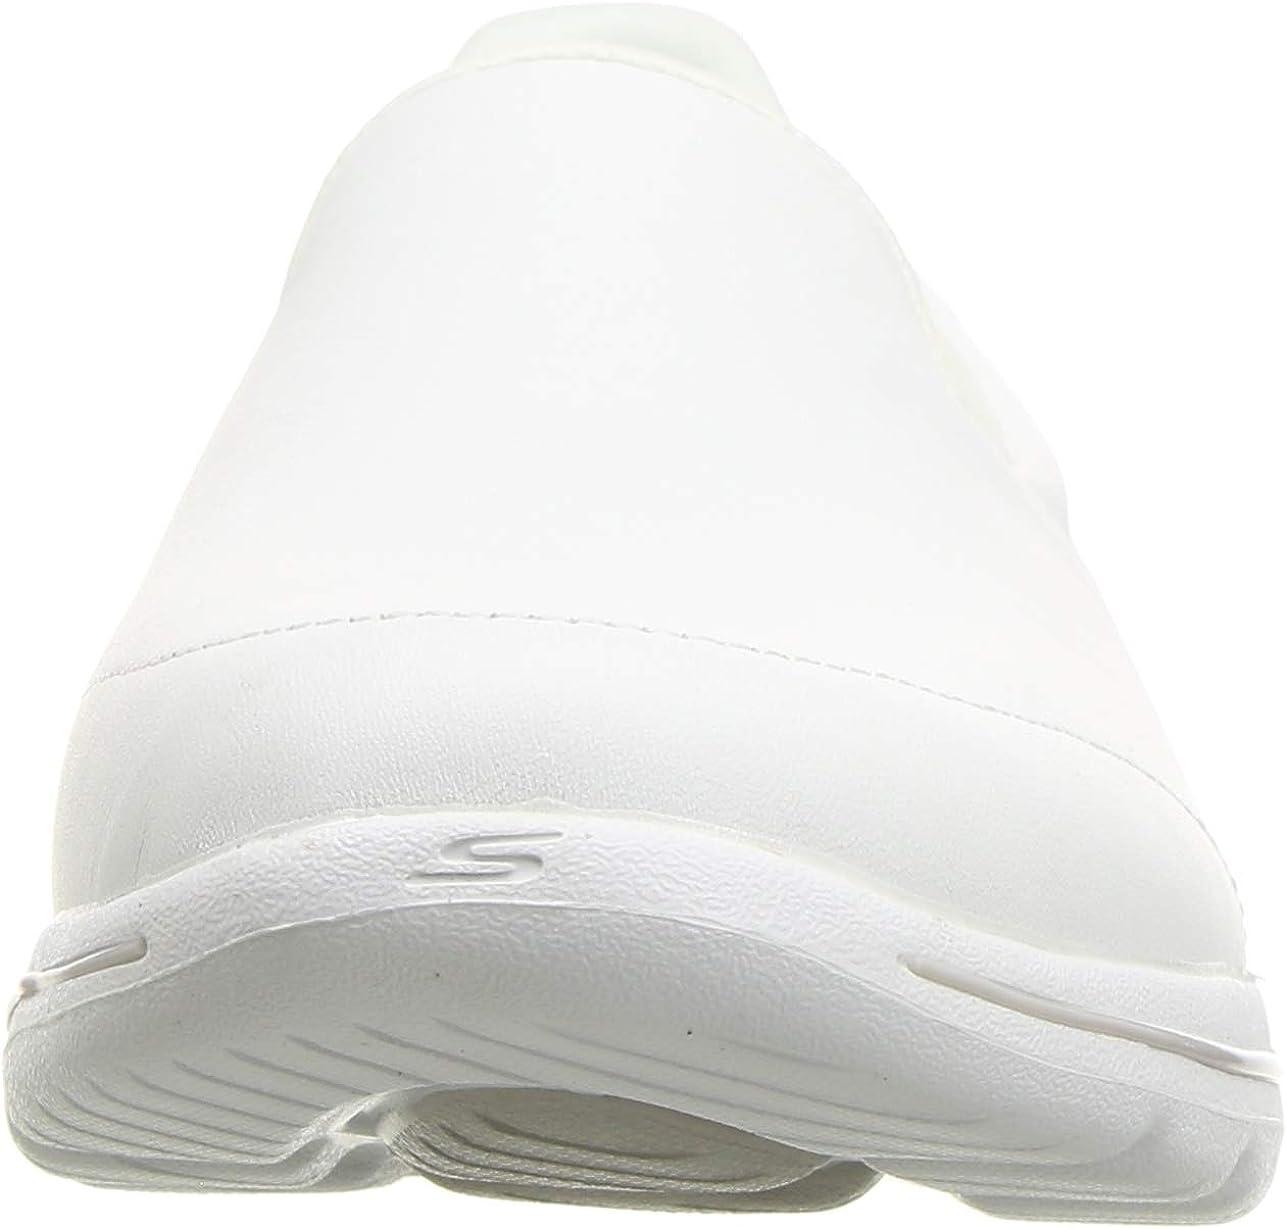 Skechers Go Walk 5 - Polished, Zapatillas sin Cordones para Mujer Blanco ( White Leather/Trim Wht)